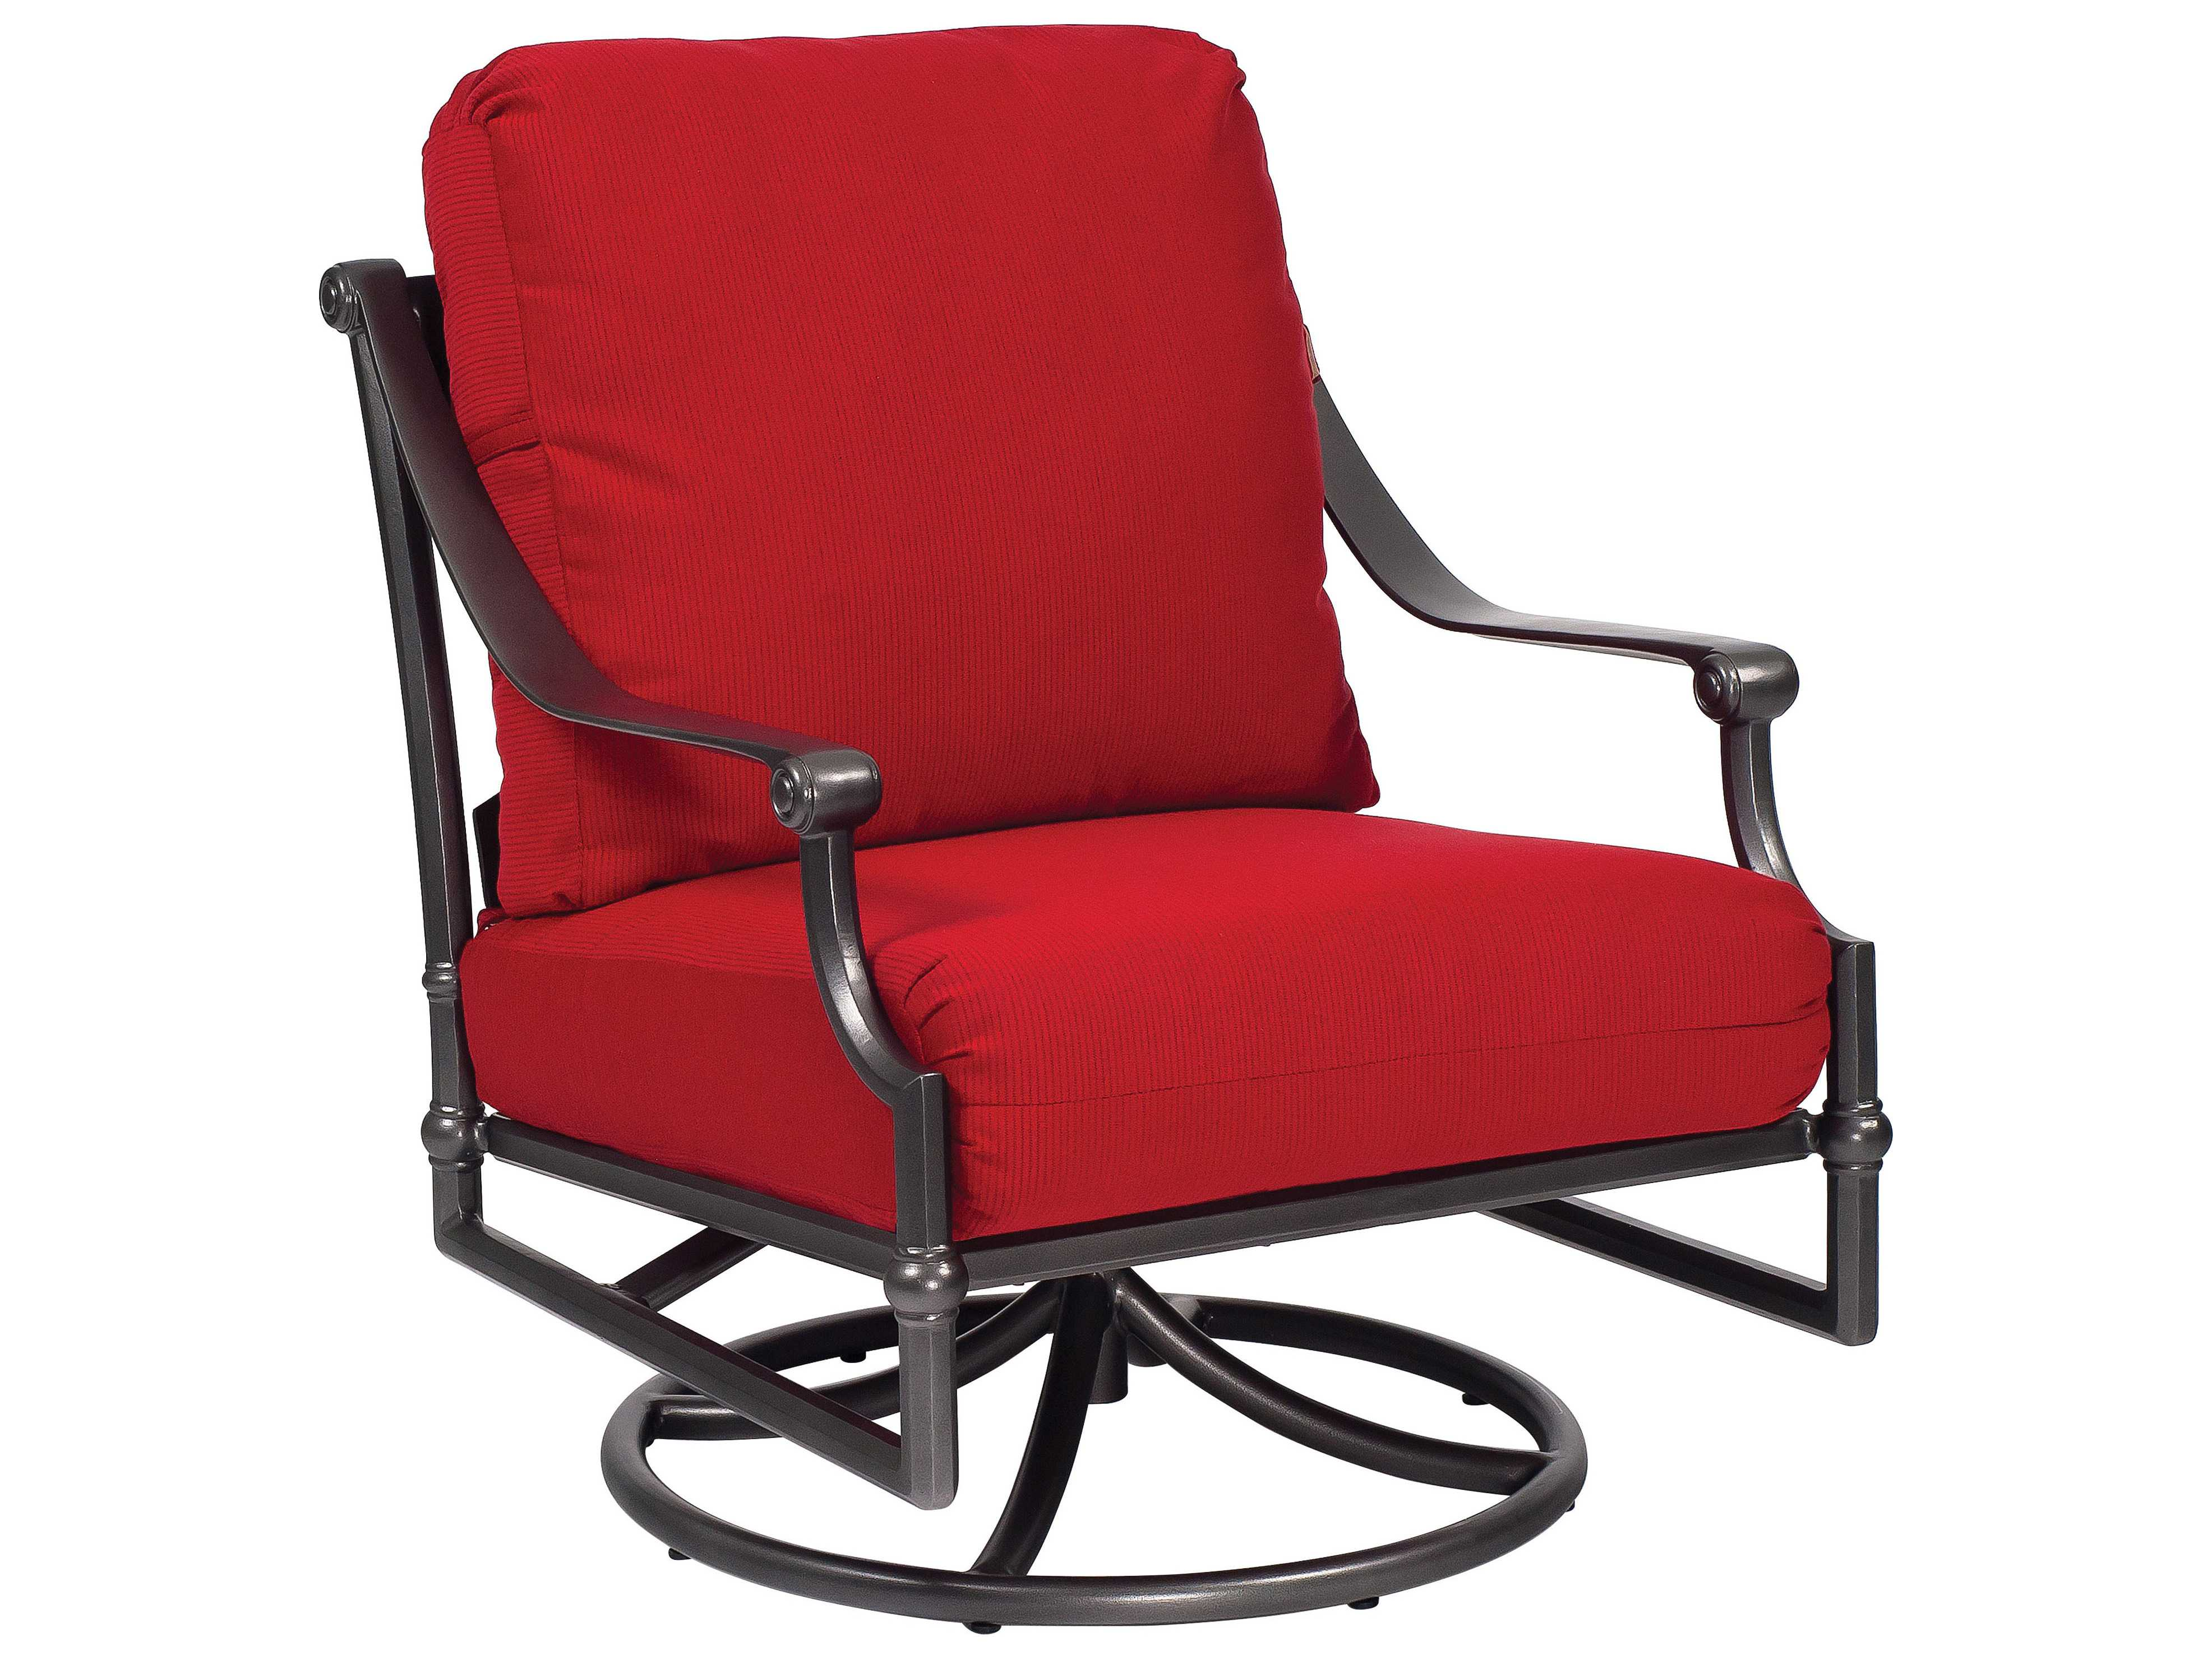 Woodard Delphi Cast Aluminum Cushion Swivel Rocking Lounge